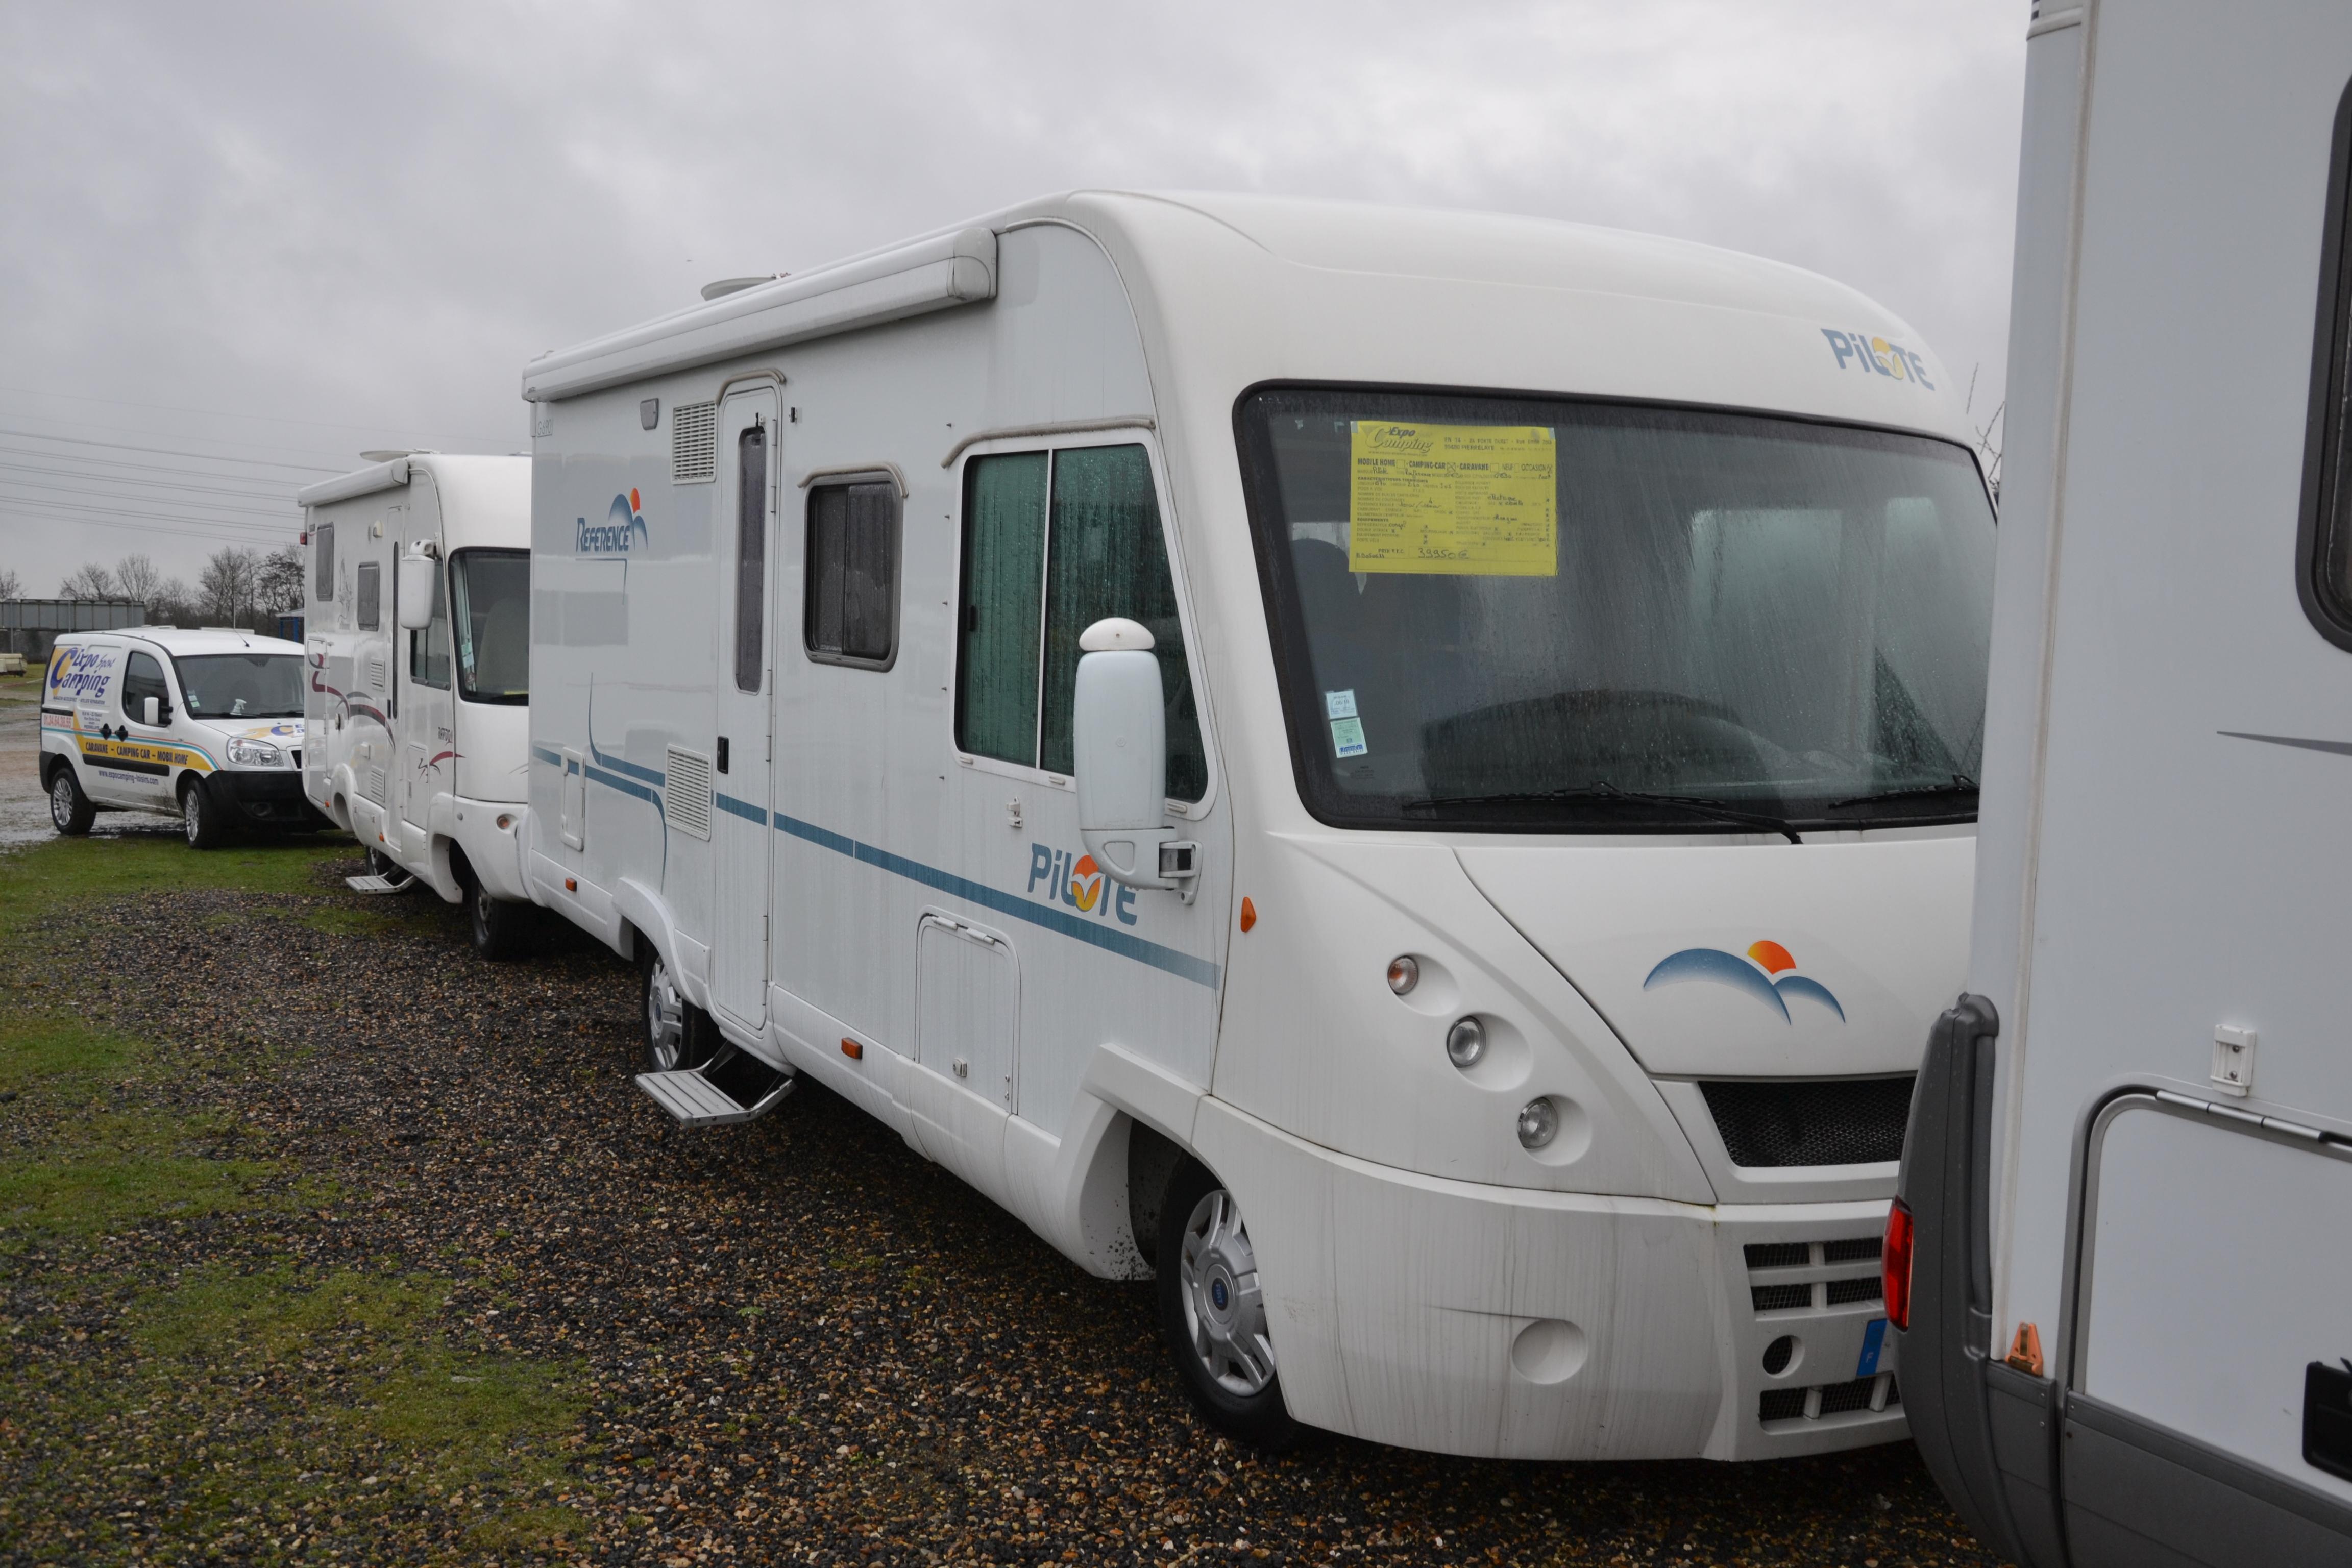 pilote reference 690 occasion de 2007 fiat camping car en vente pierrelaye val d oise 95. Black Bedroom Furniture Sets. Home Design Ideas